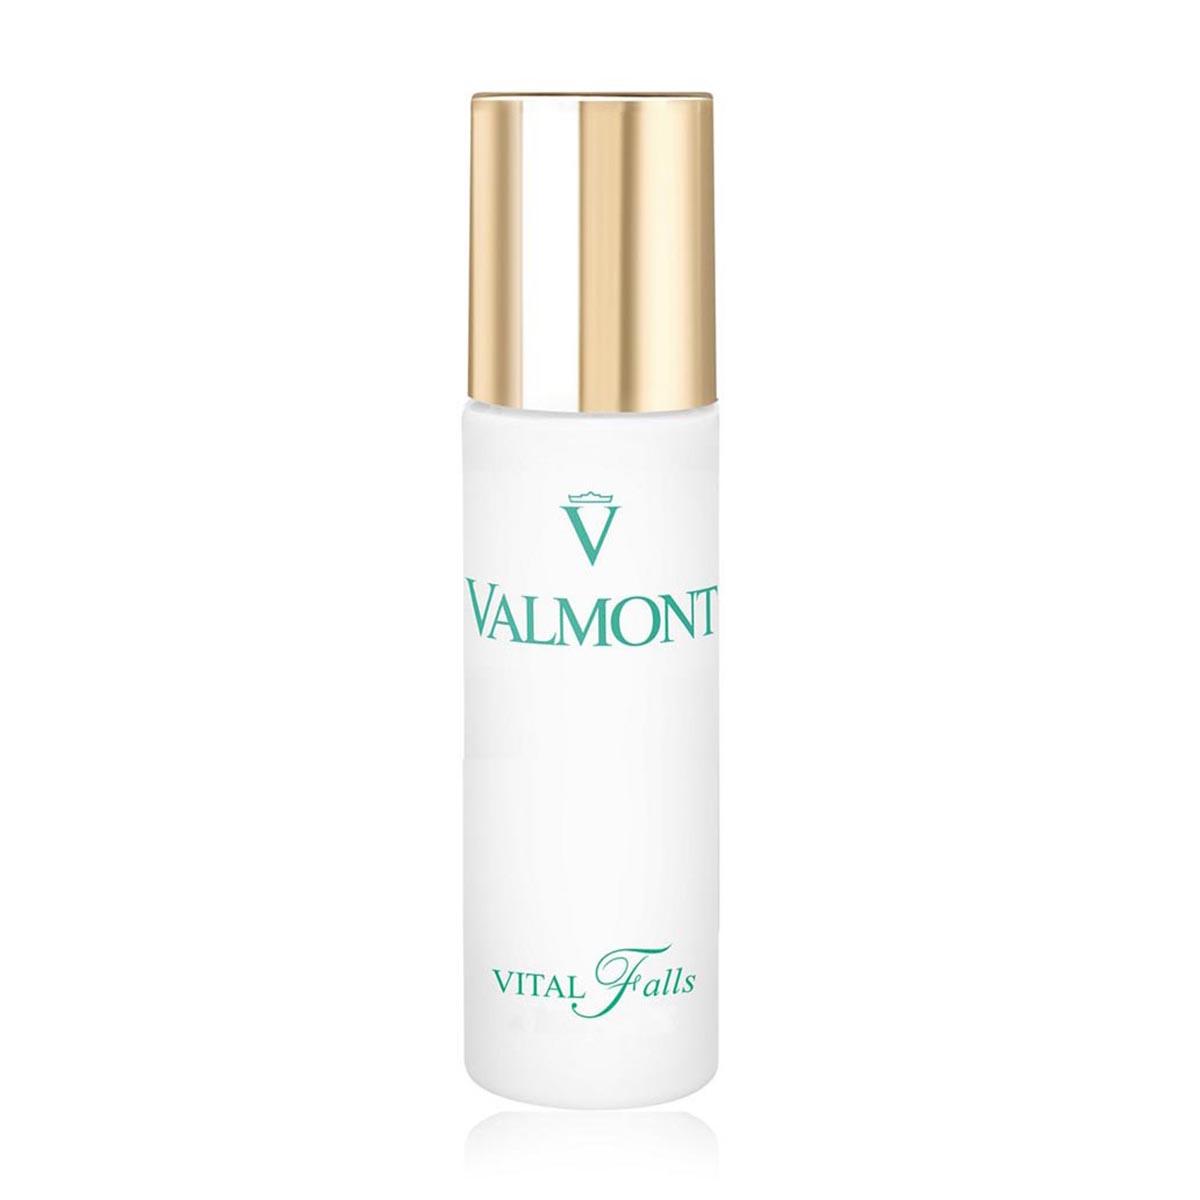 Valmont vital falls 75ml